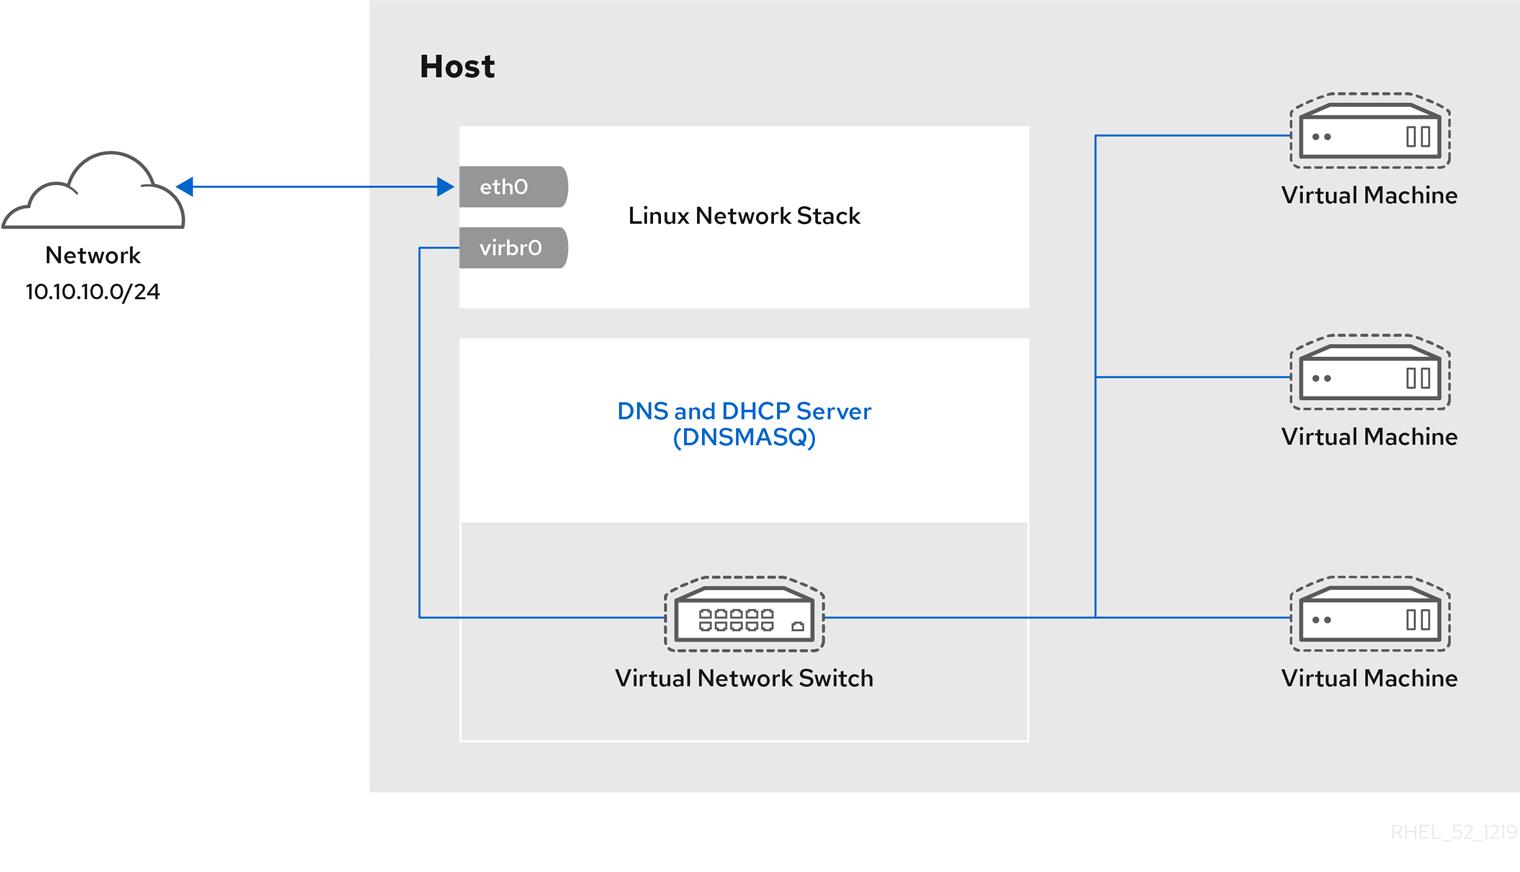 libvirt のデフォルトネットワーク設定